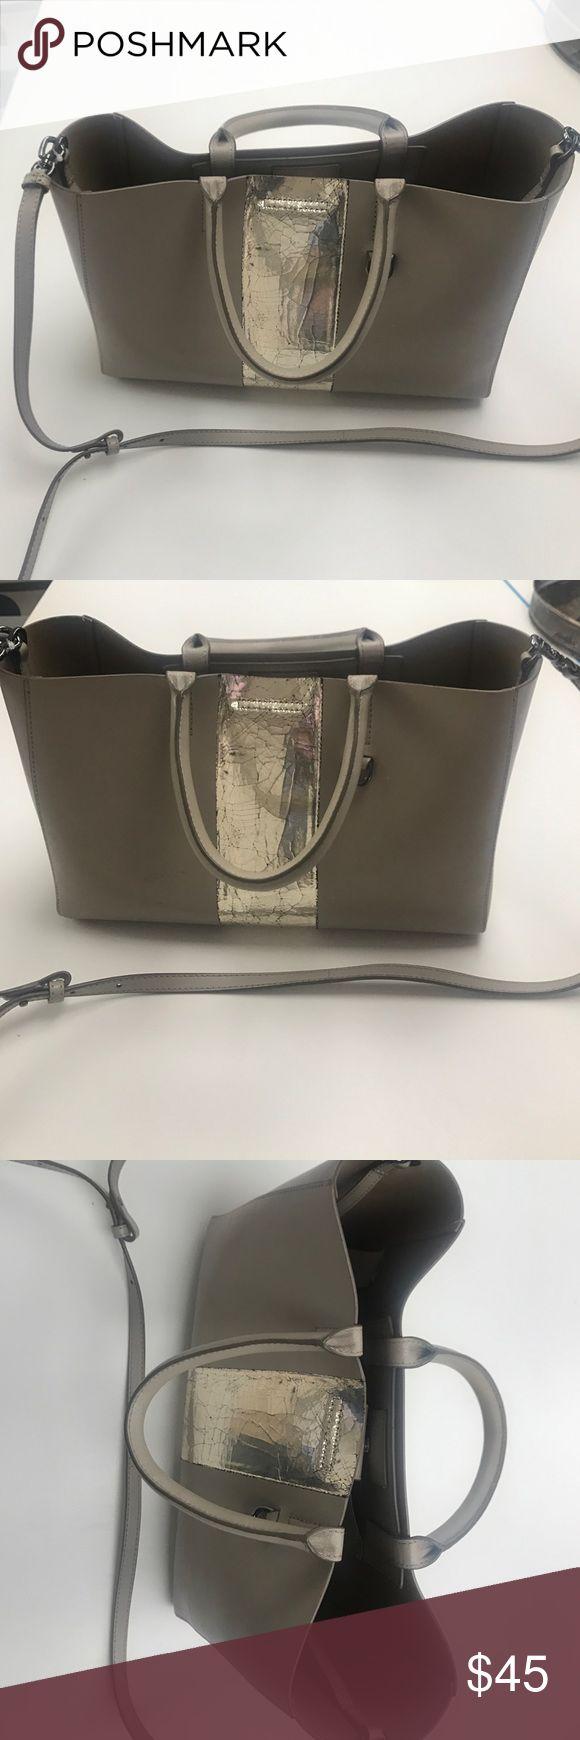 Banana republic handbag Super cute tote with shoulder strap and metallic detail panel Banana Republic Bags Totes